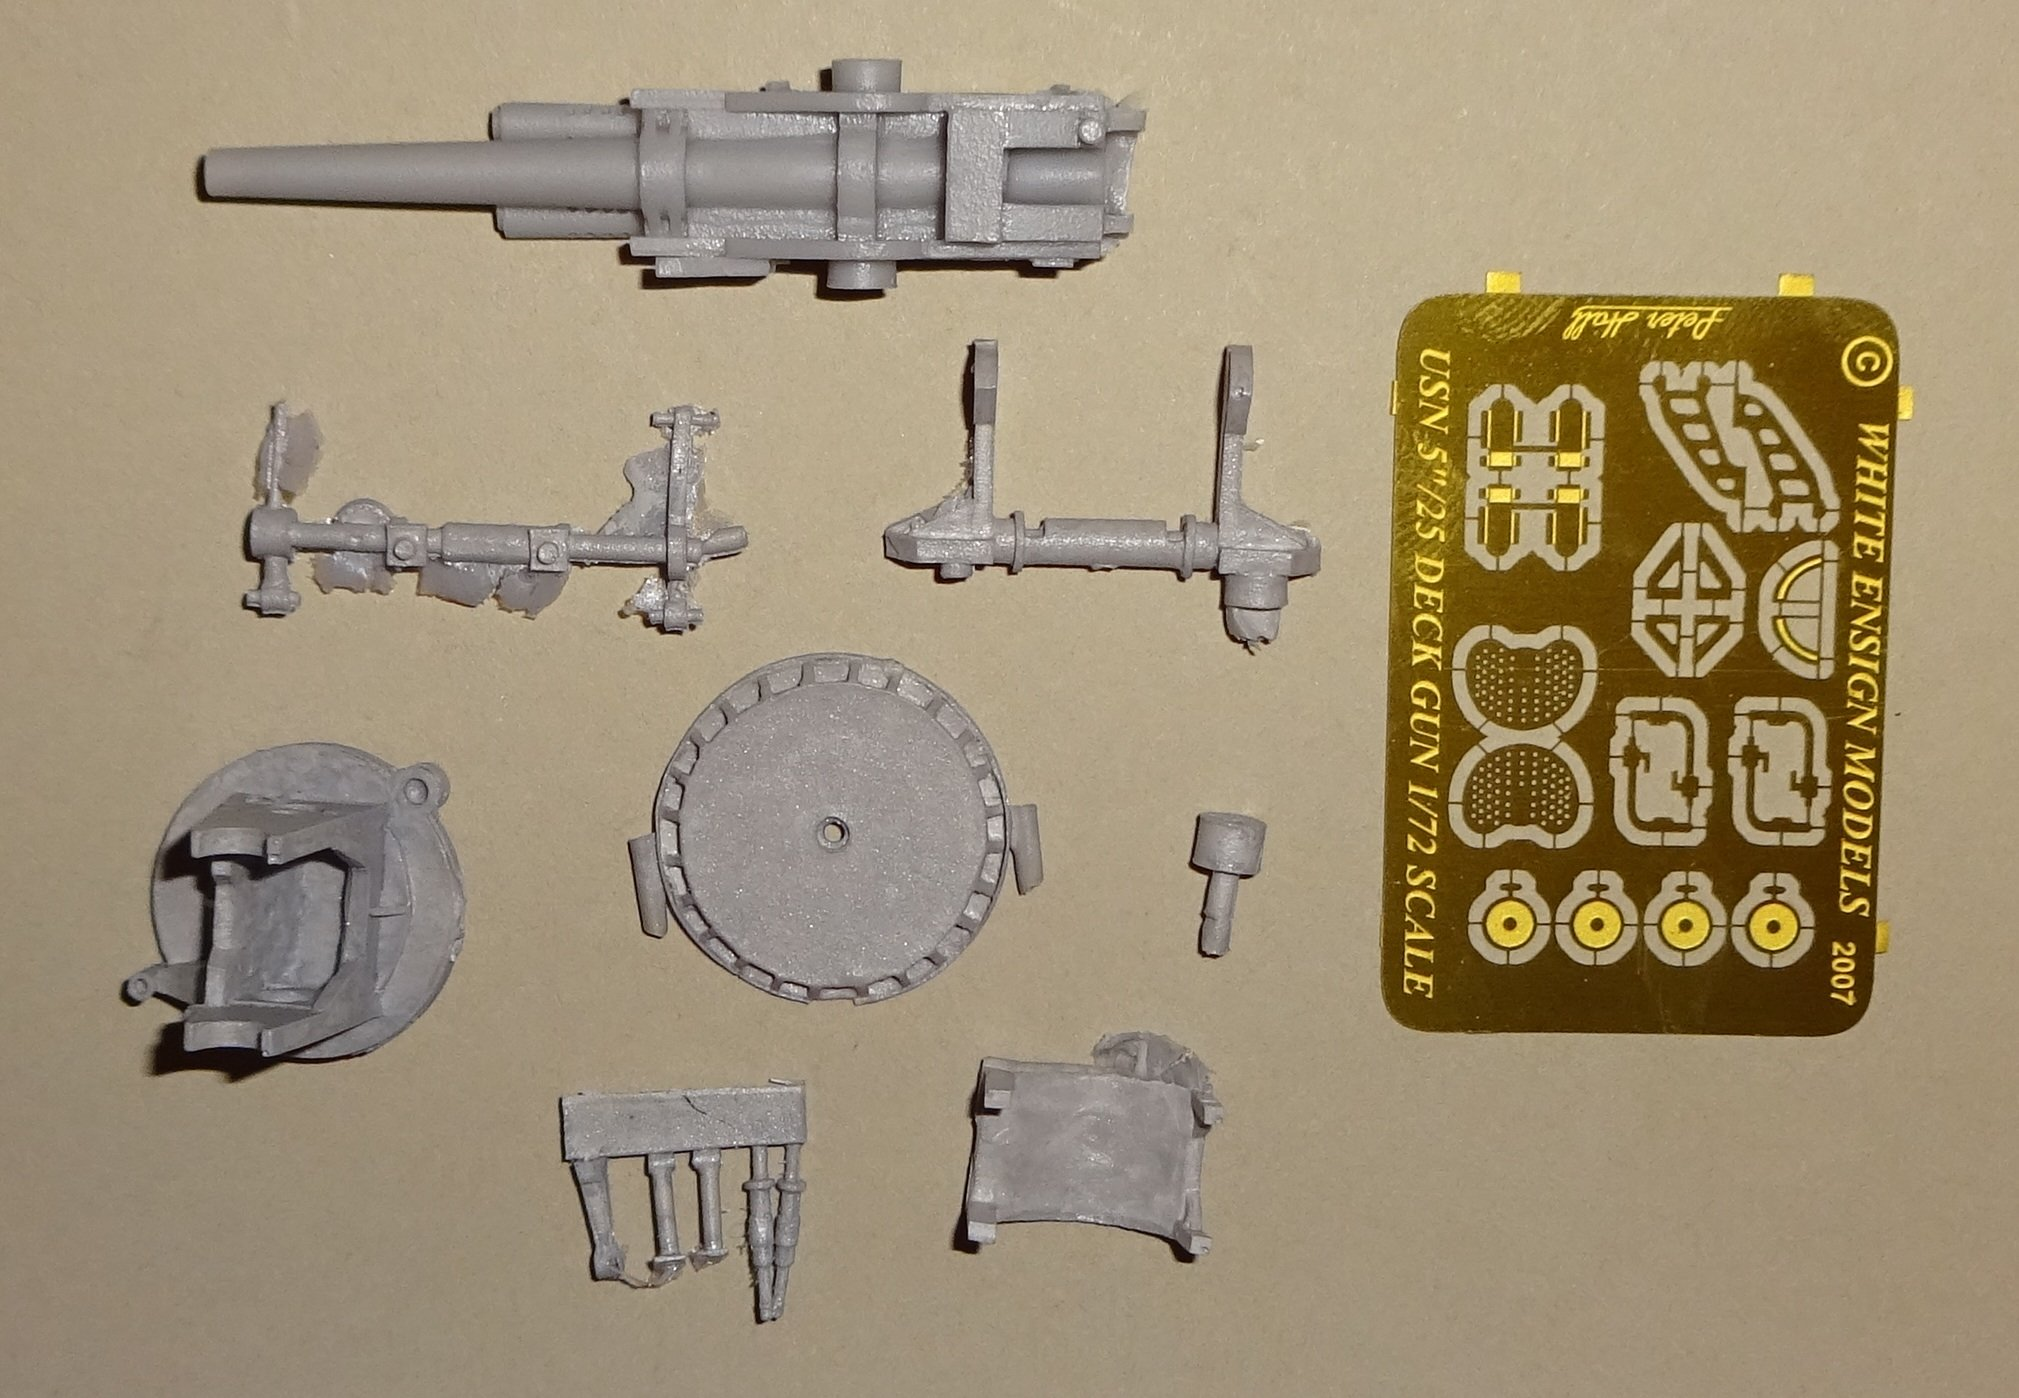 1-72 Scale Accessories